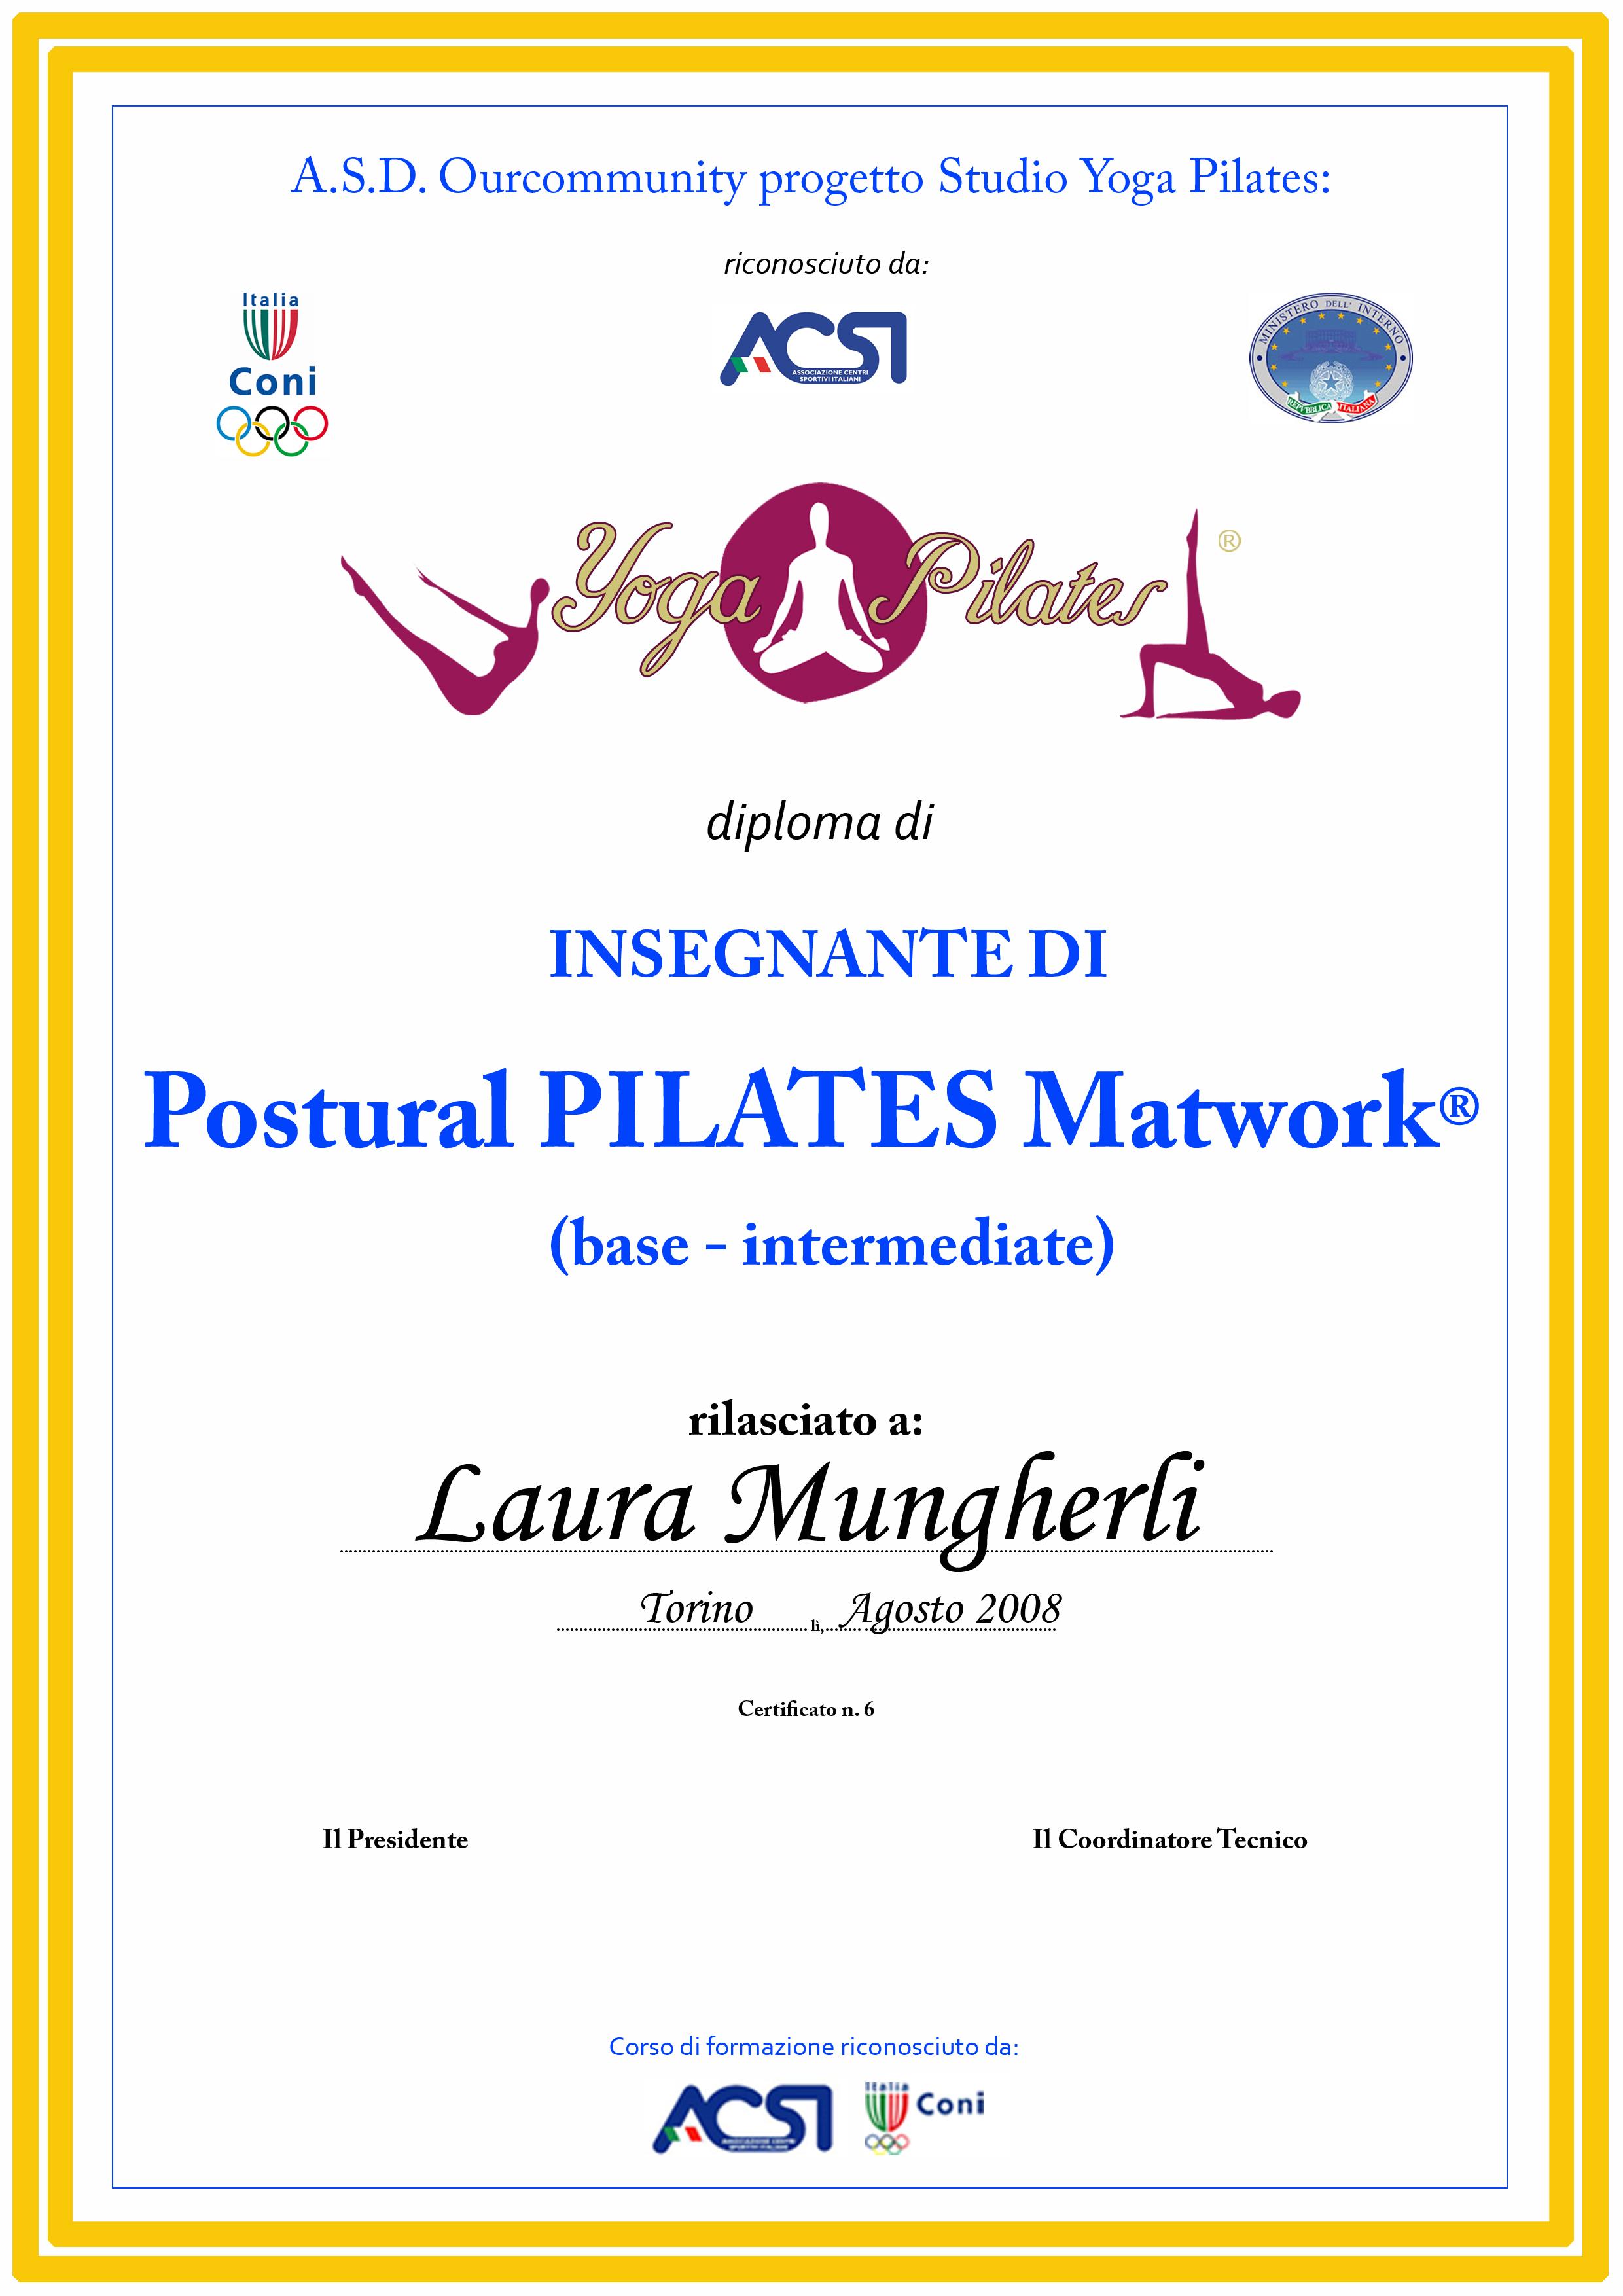 Diploma insegnante Postural Pilates Matwork®